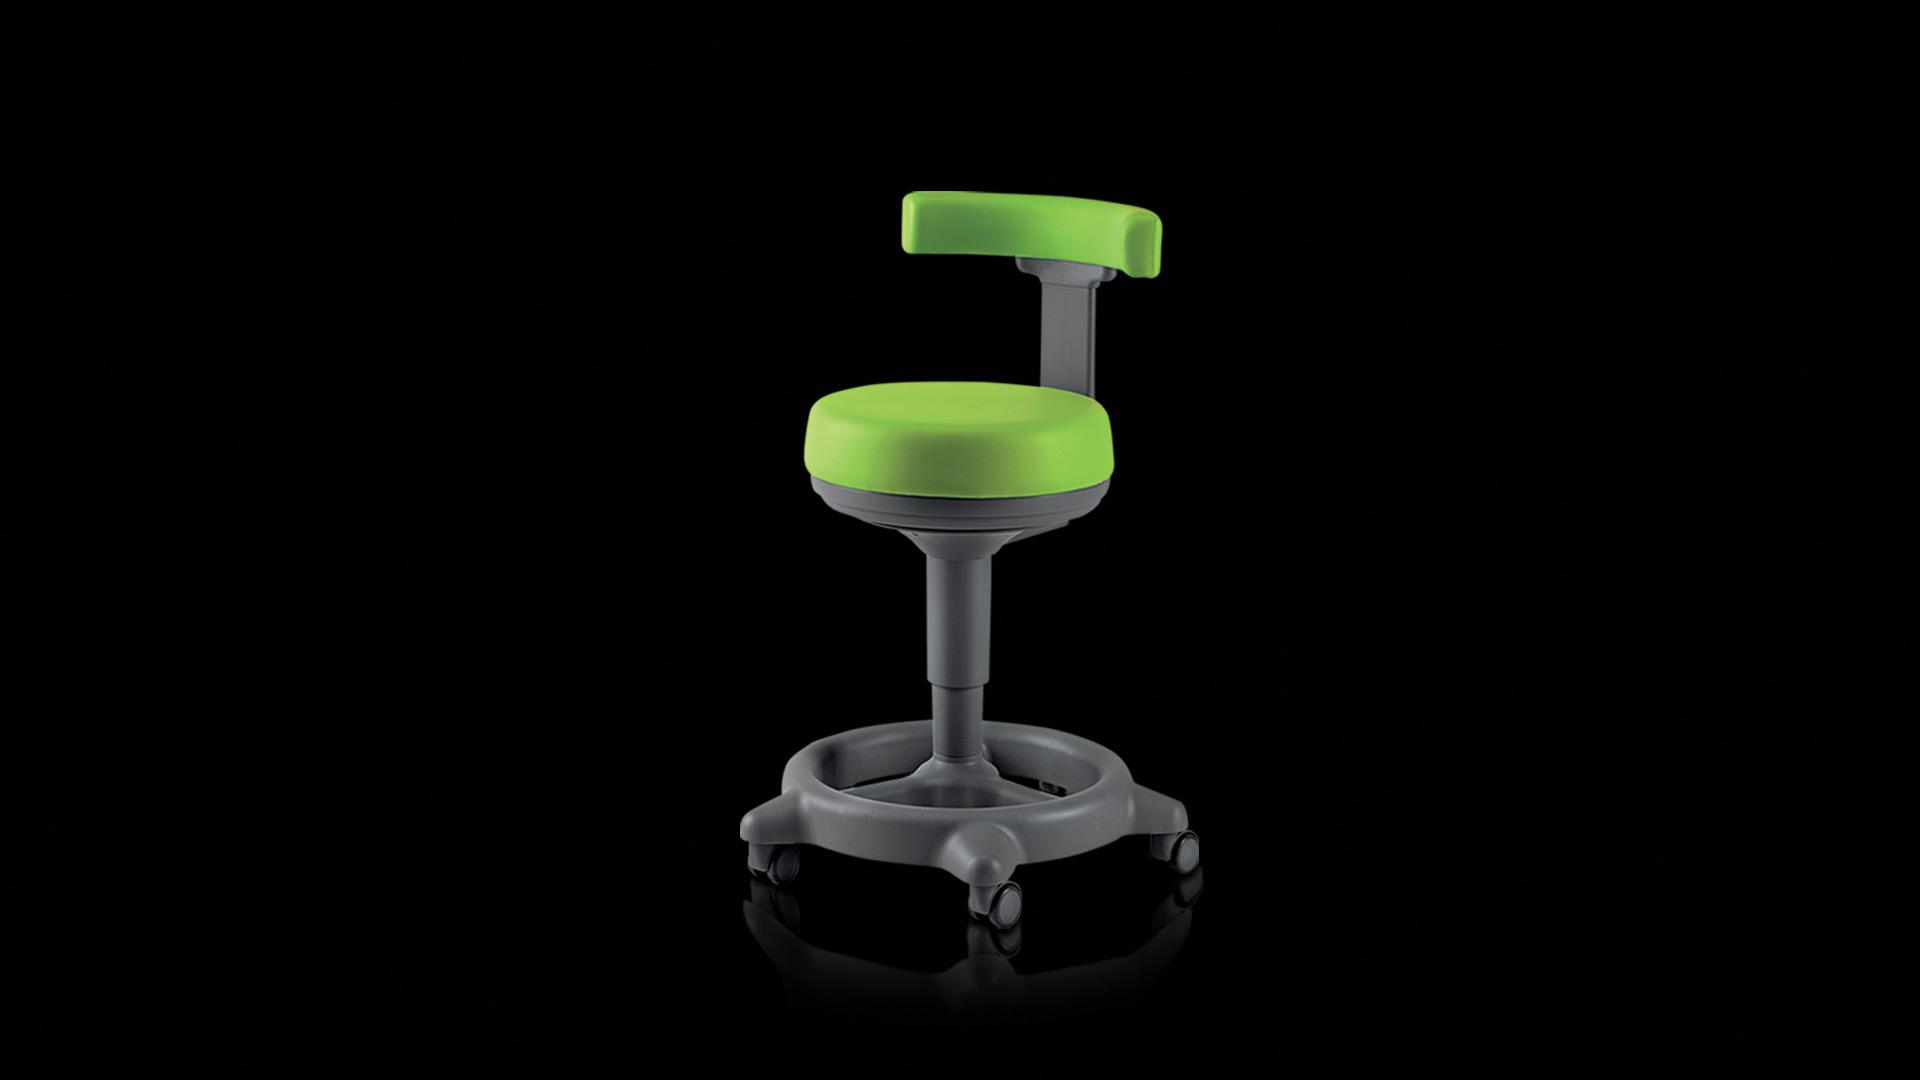 seggiolino verde - green stool